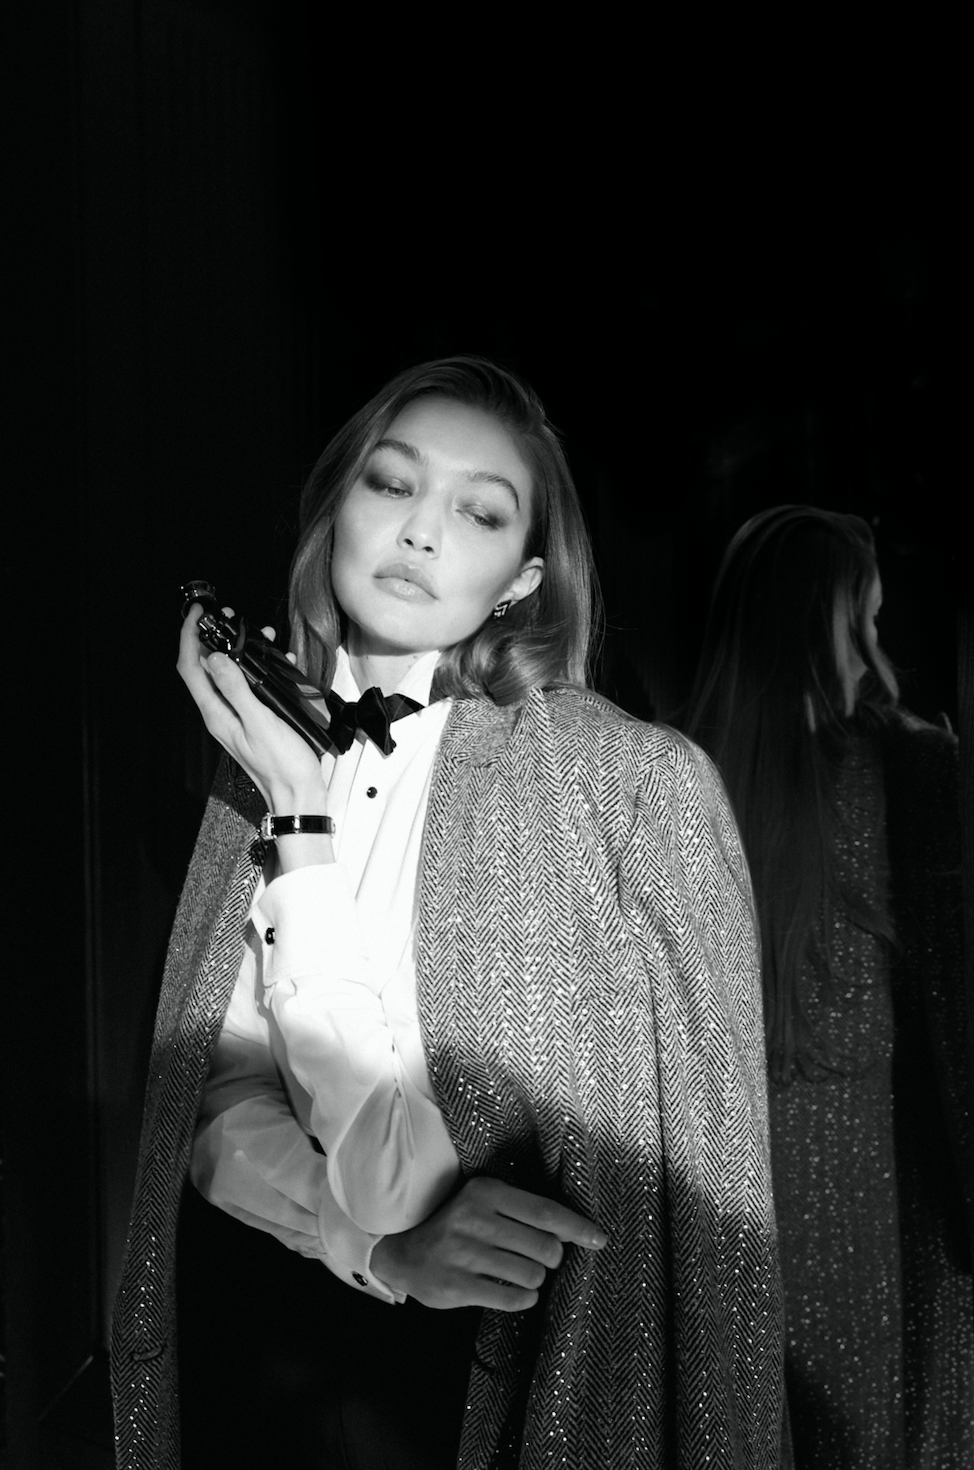 Gigi Hadid on Motherhood, Beauty, and Her New Ralph's Club Fragrance Campaign